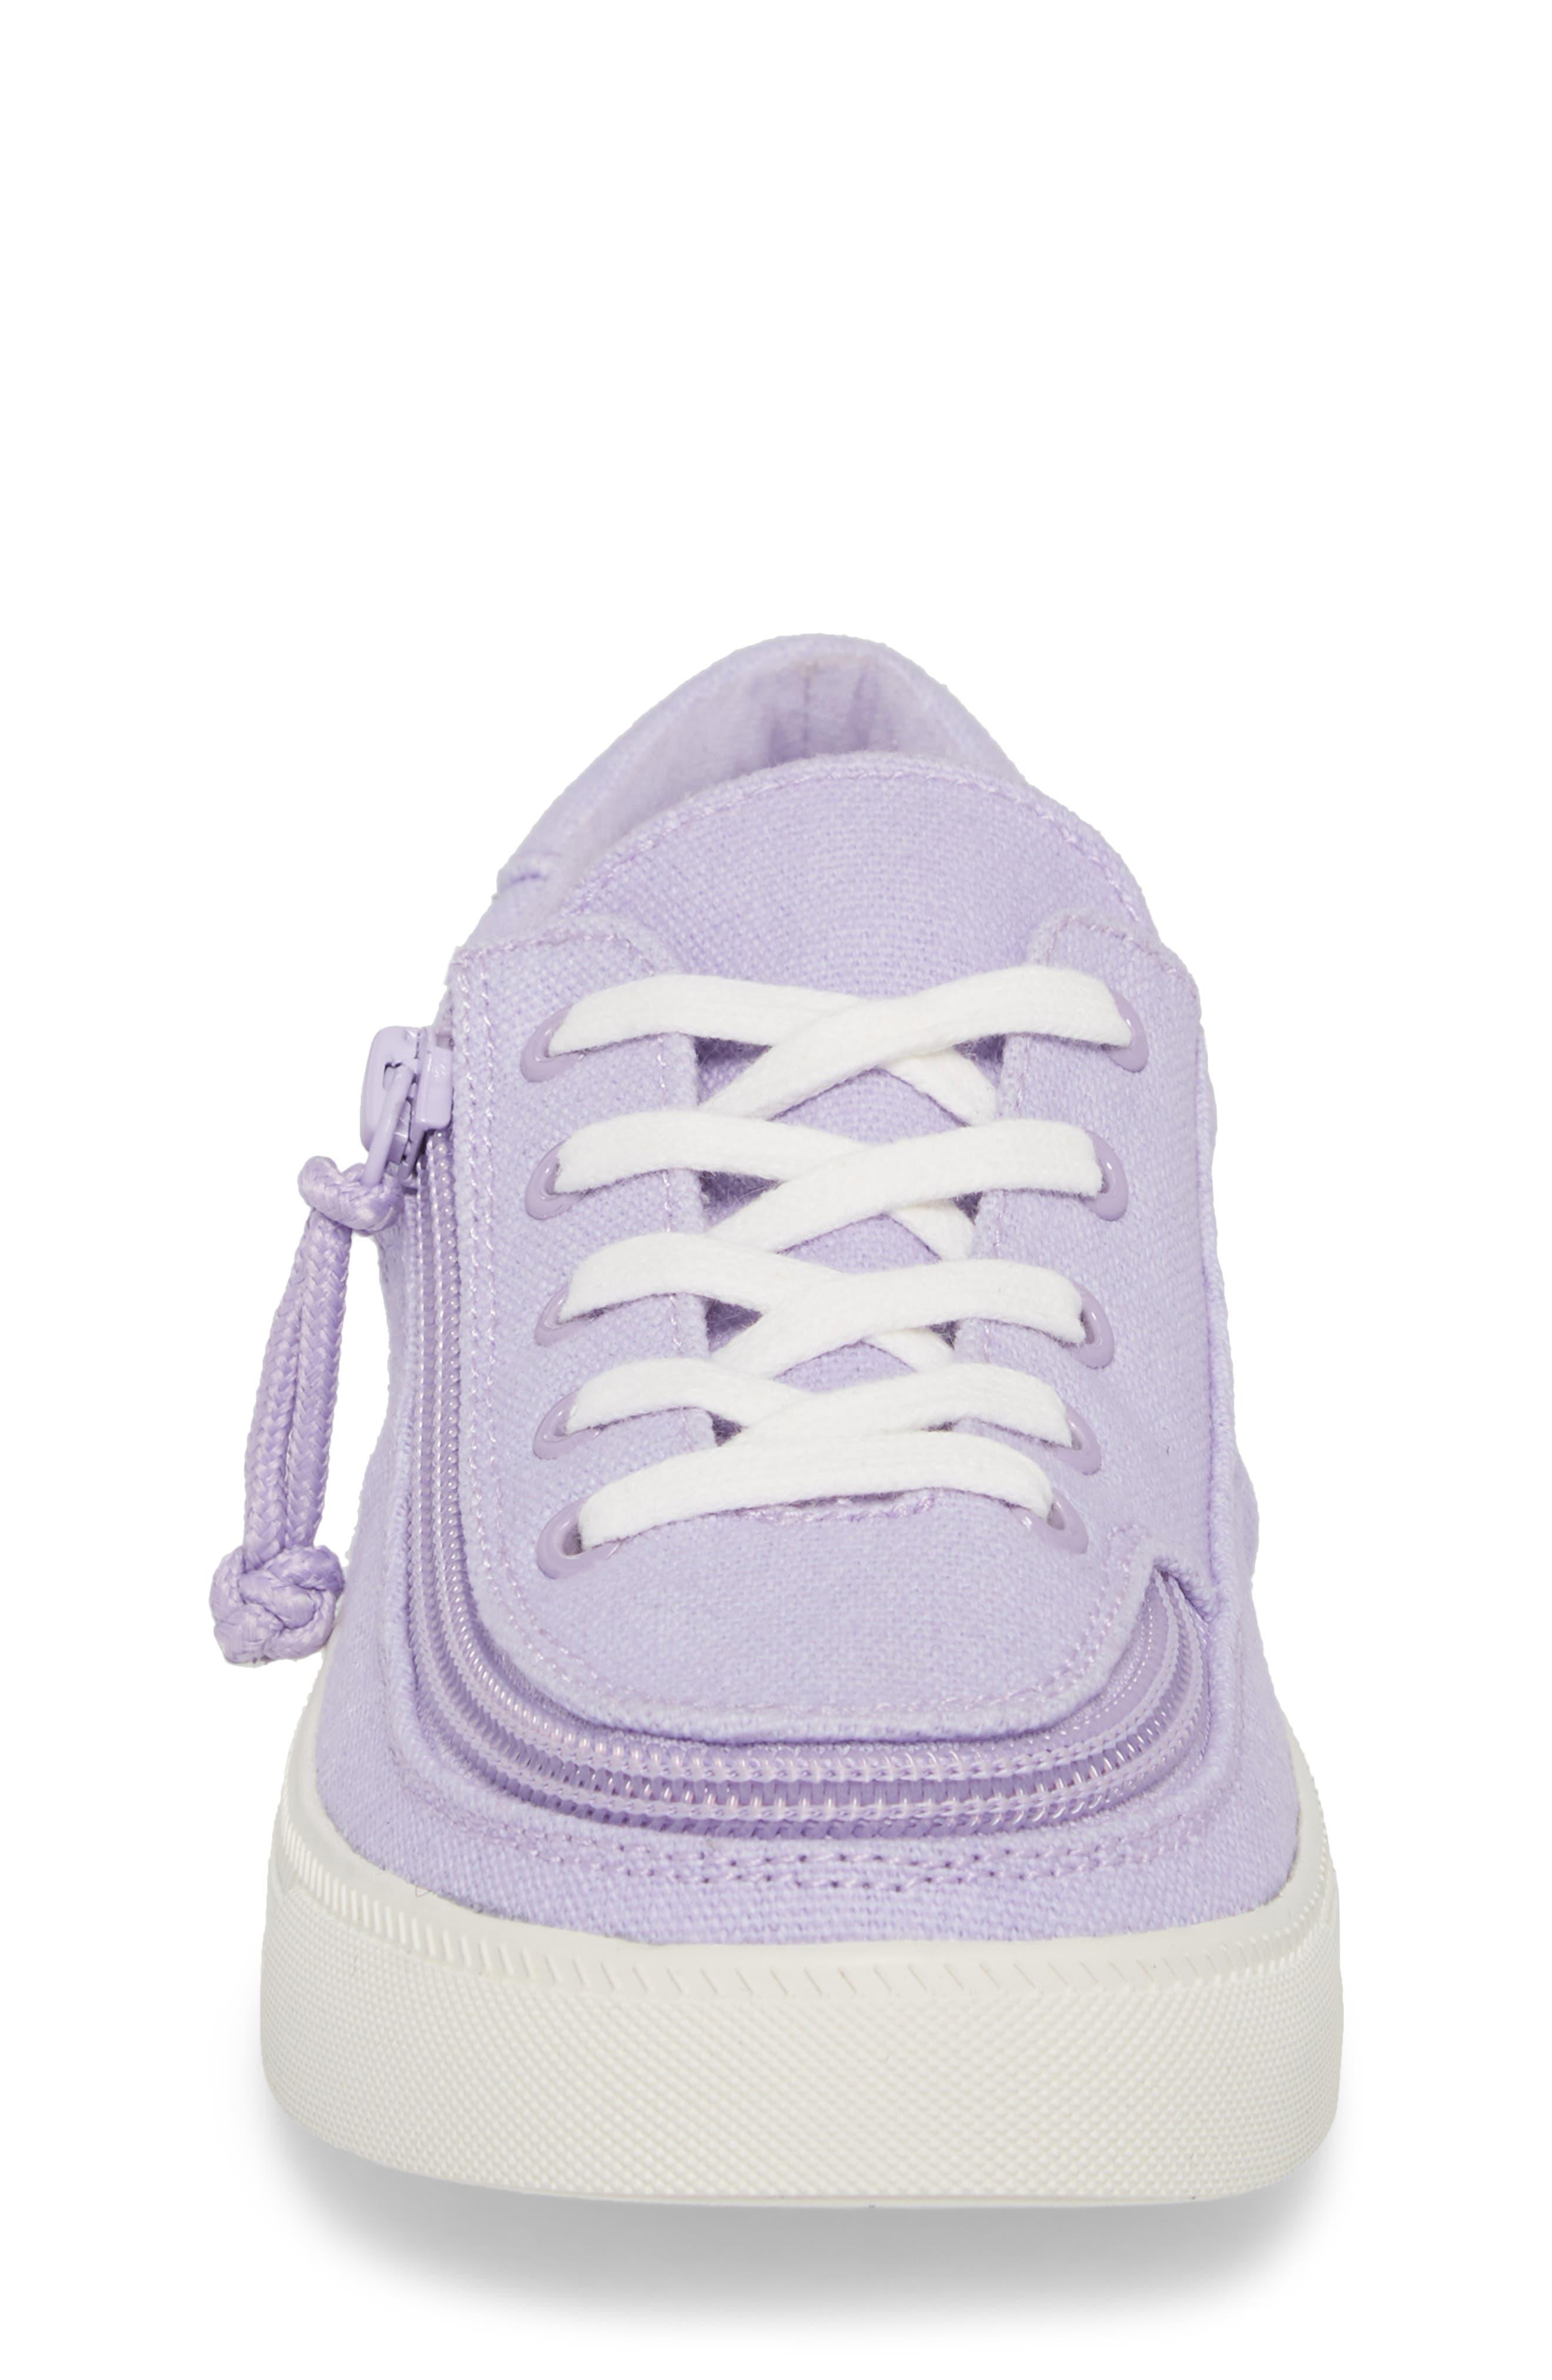 BILLY FOOTWEAR, Classic Zip Around Low Top Sneaker, Alternate thumbnail 5, color, LAVENDER